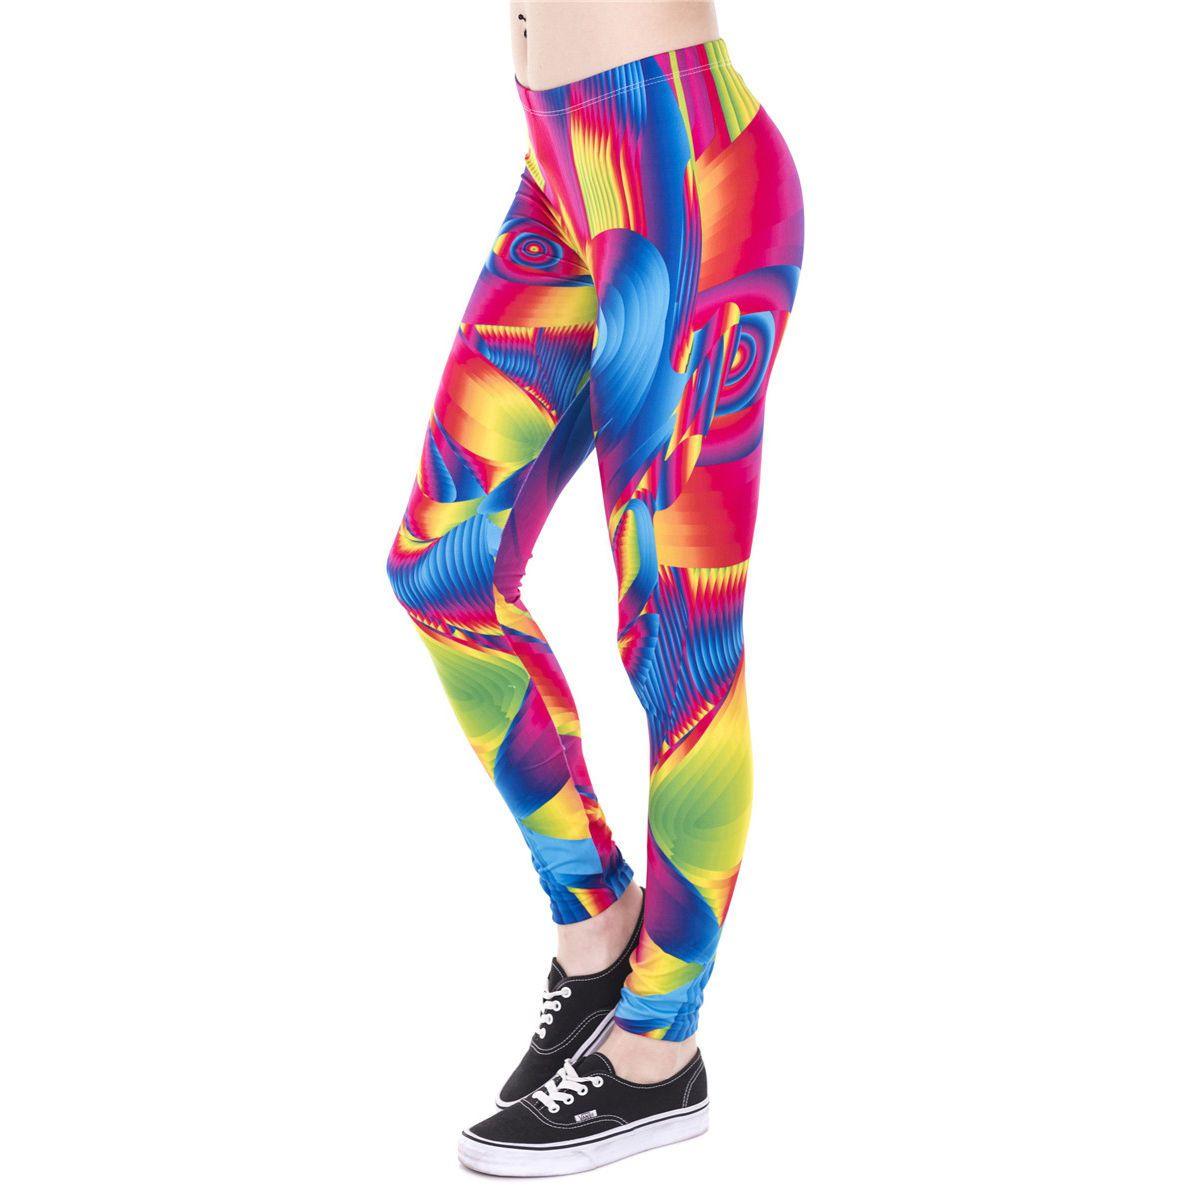 5891adc348b9b J43865 Lady Ultra Color Face 3D Graphic Print Stretchy Pants Yoga Soft  Leggings | eBay